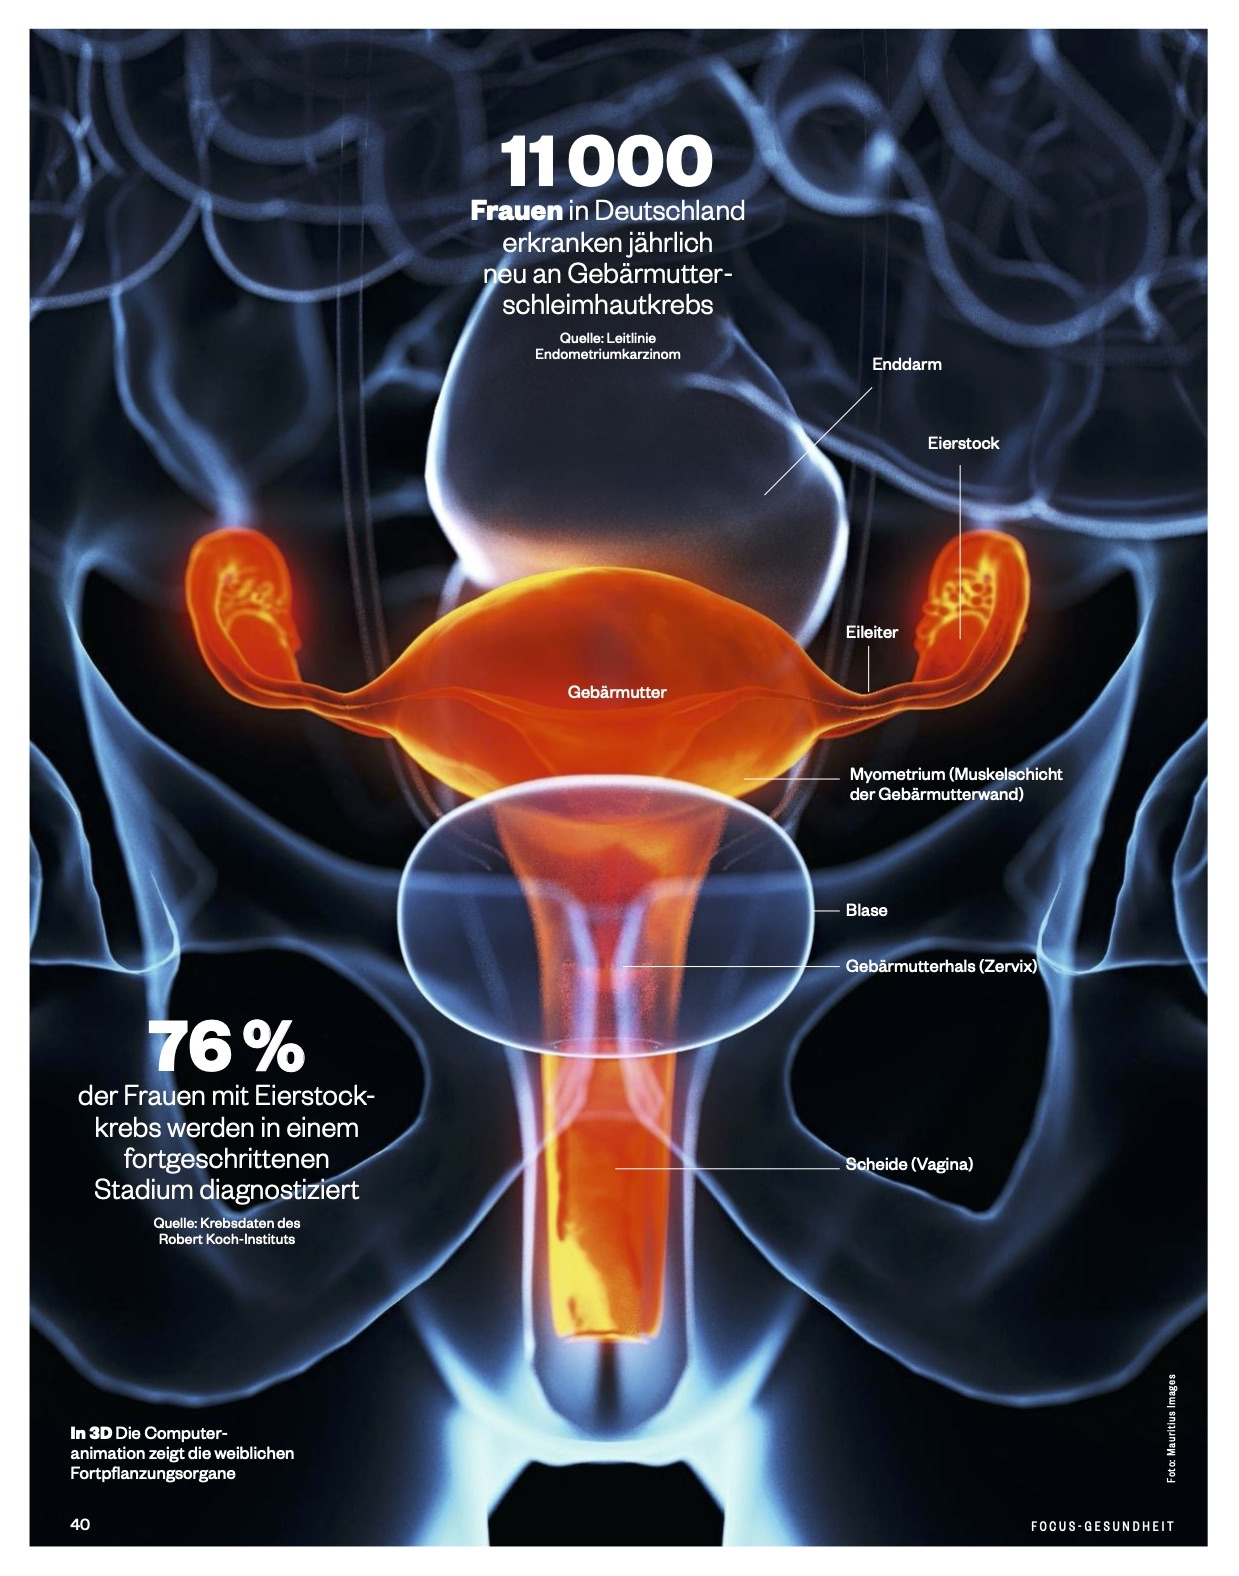 FOCUS-GESUNDHEIT FOCUS Gesundheit - Krebs 2021